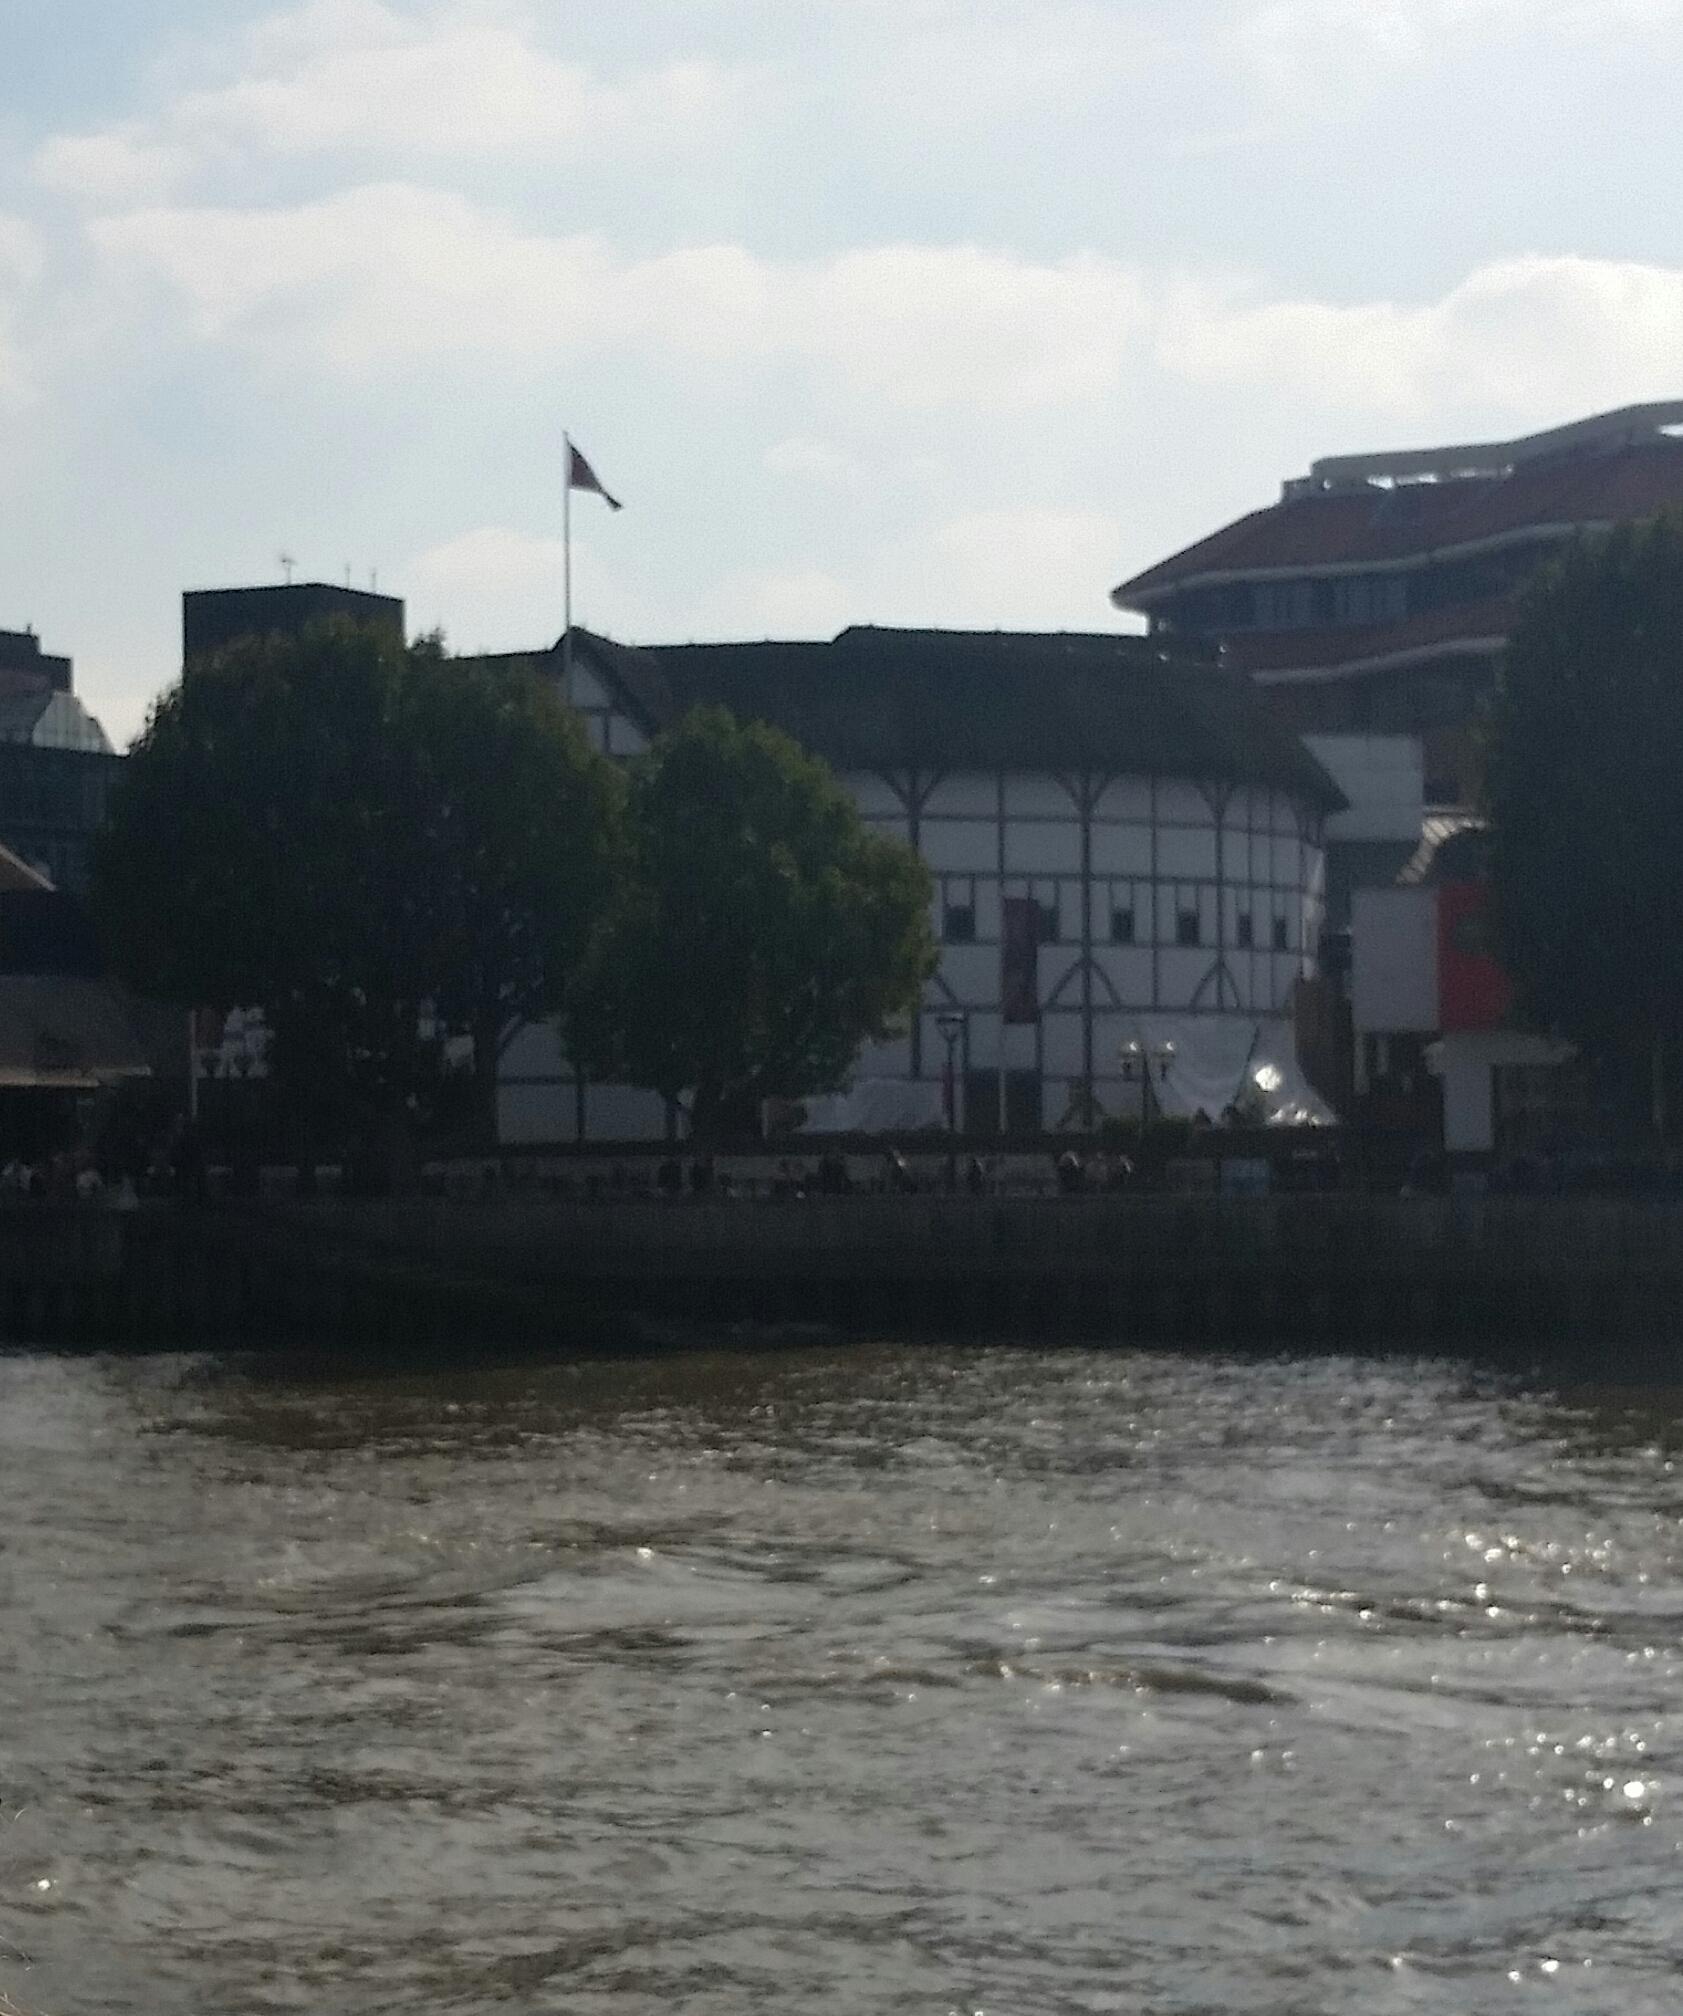 Shakespeare's famous Globe Theatre